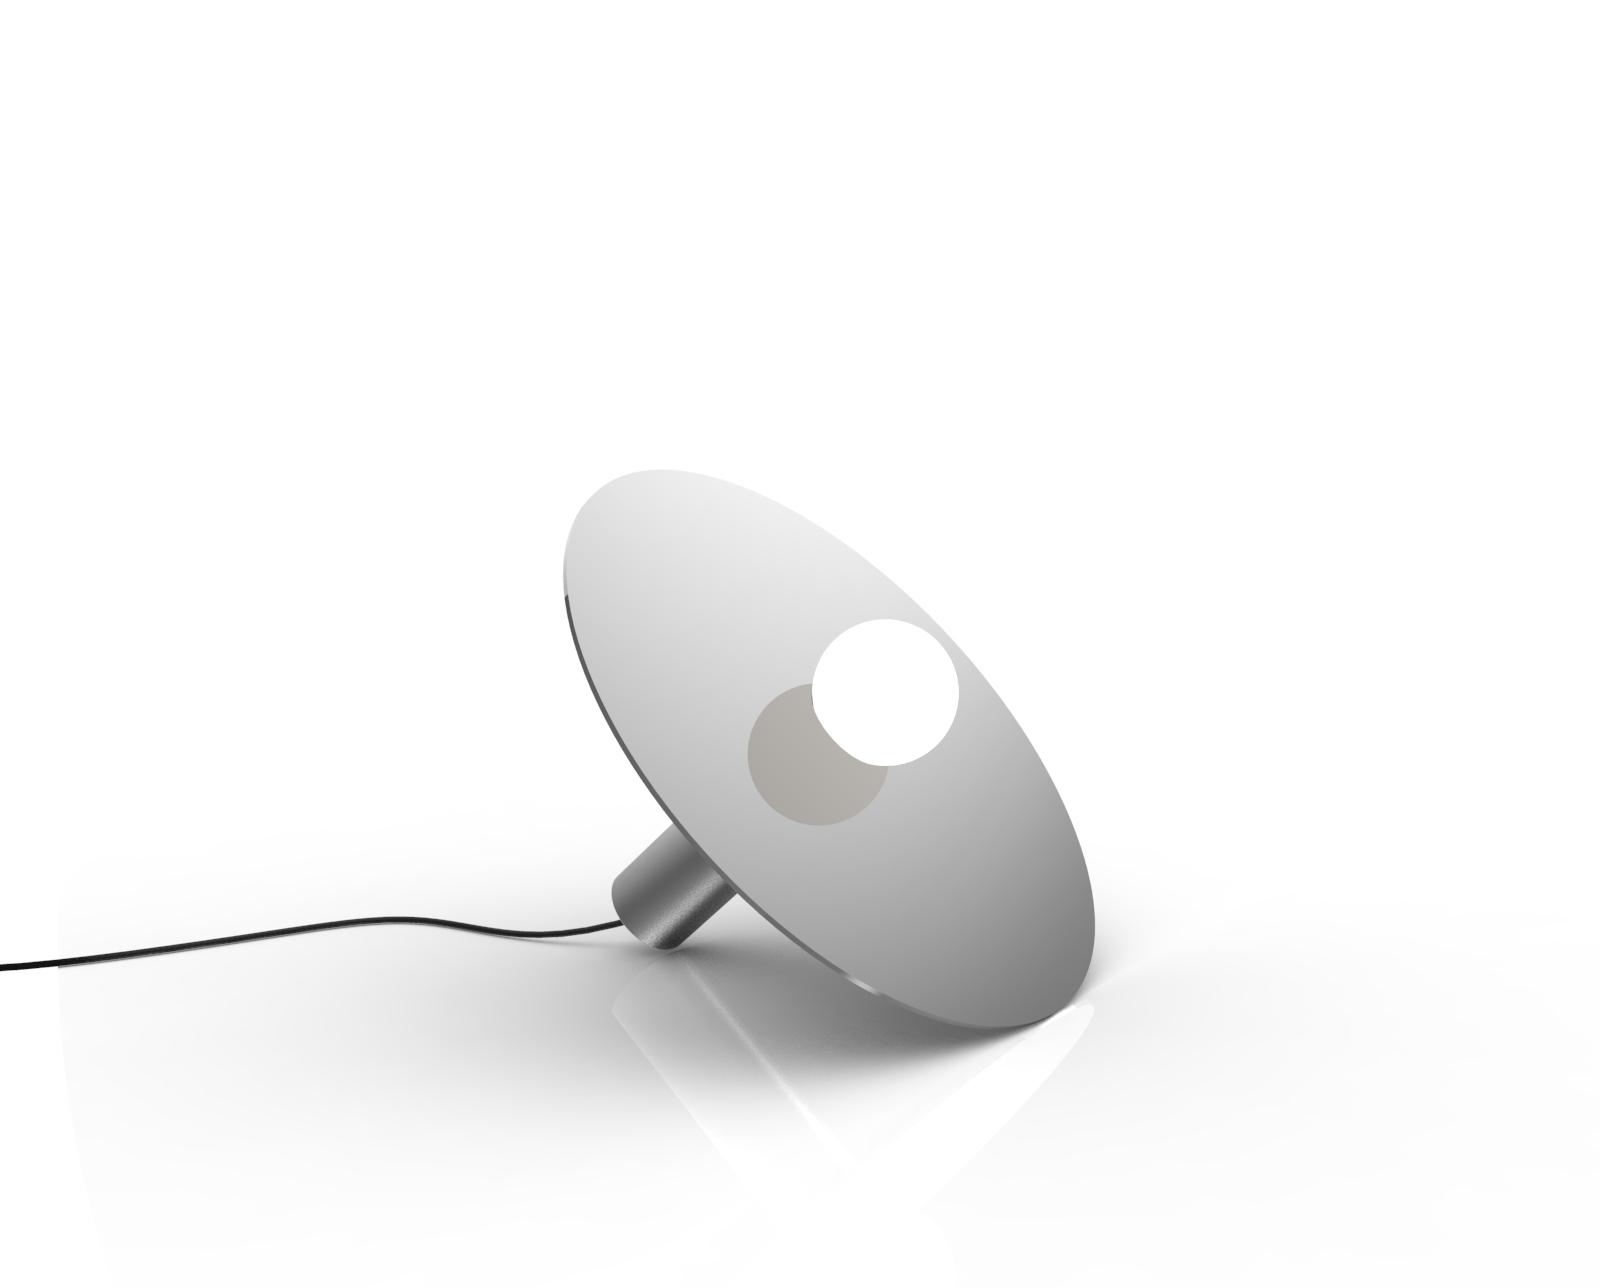 ORBITA Floor lamp in brushed/polished stainless steel - Chiara Ferrari x Graye